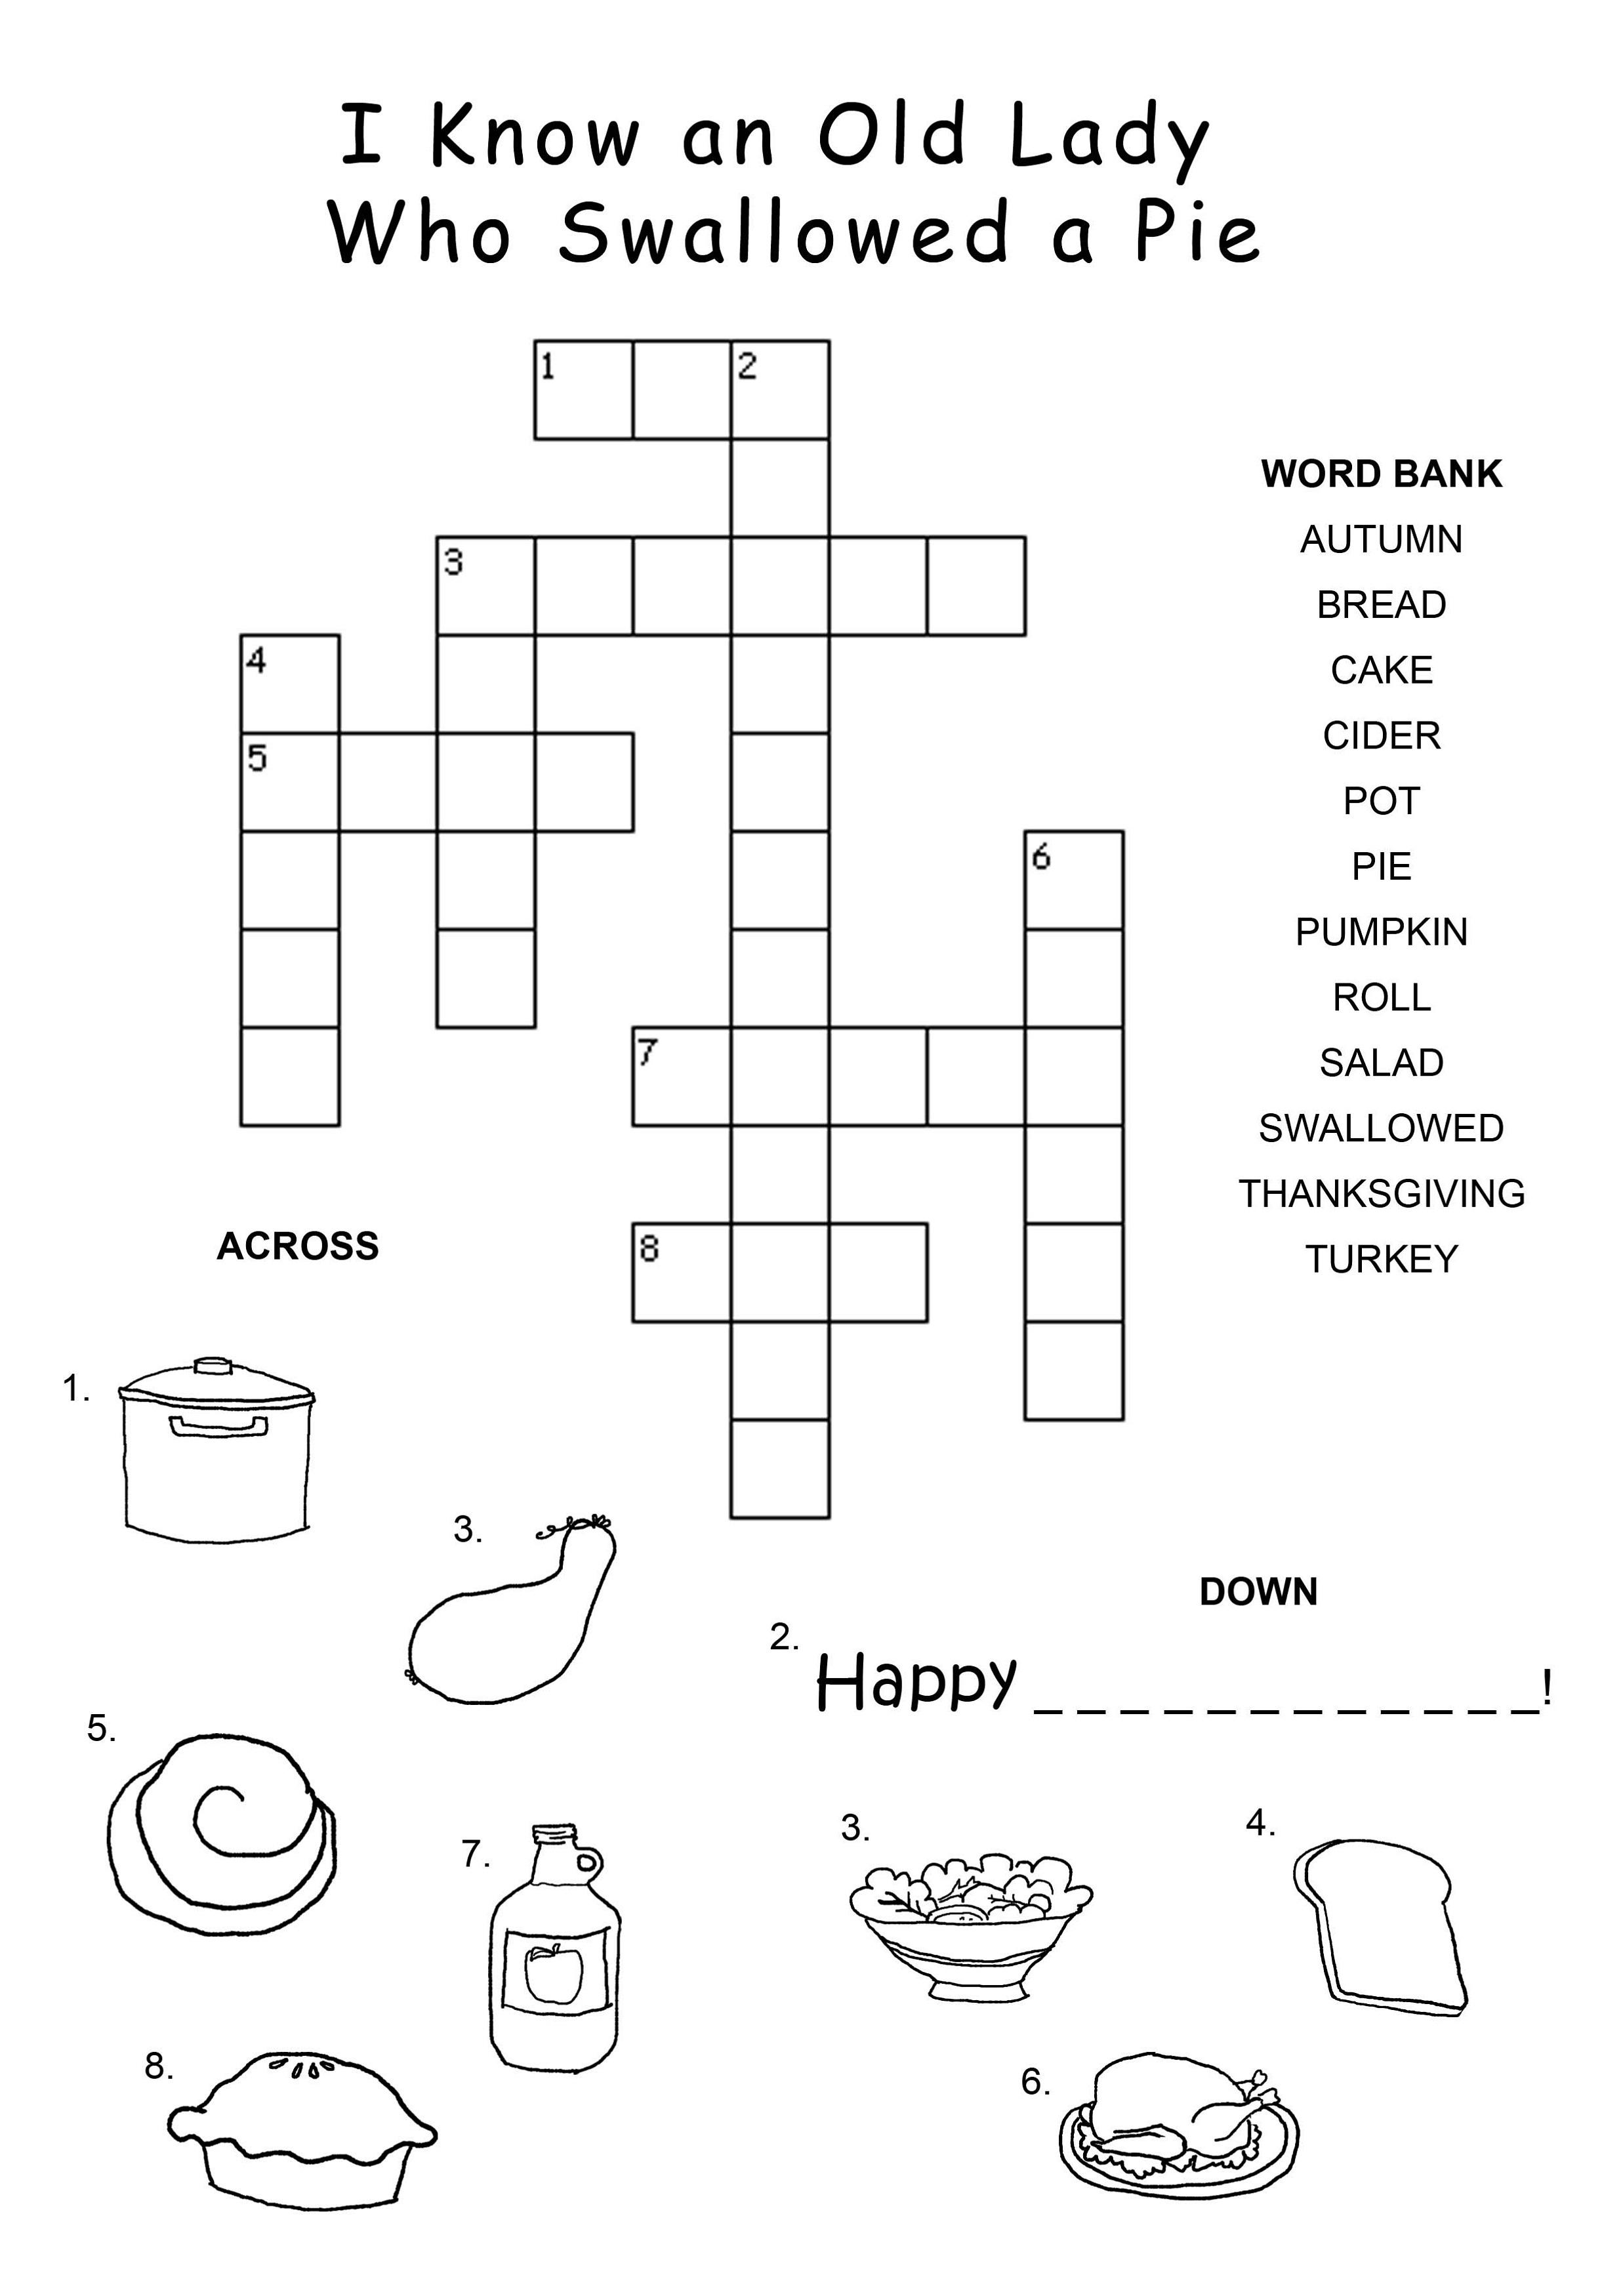 Easy Crossword Puzzles For Kids | Kiddo Shelter - Printable Crosswords For 5 Year Olds